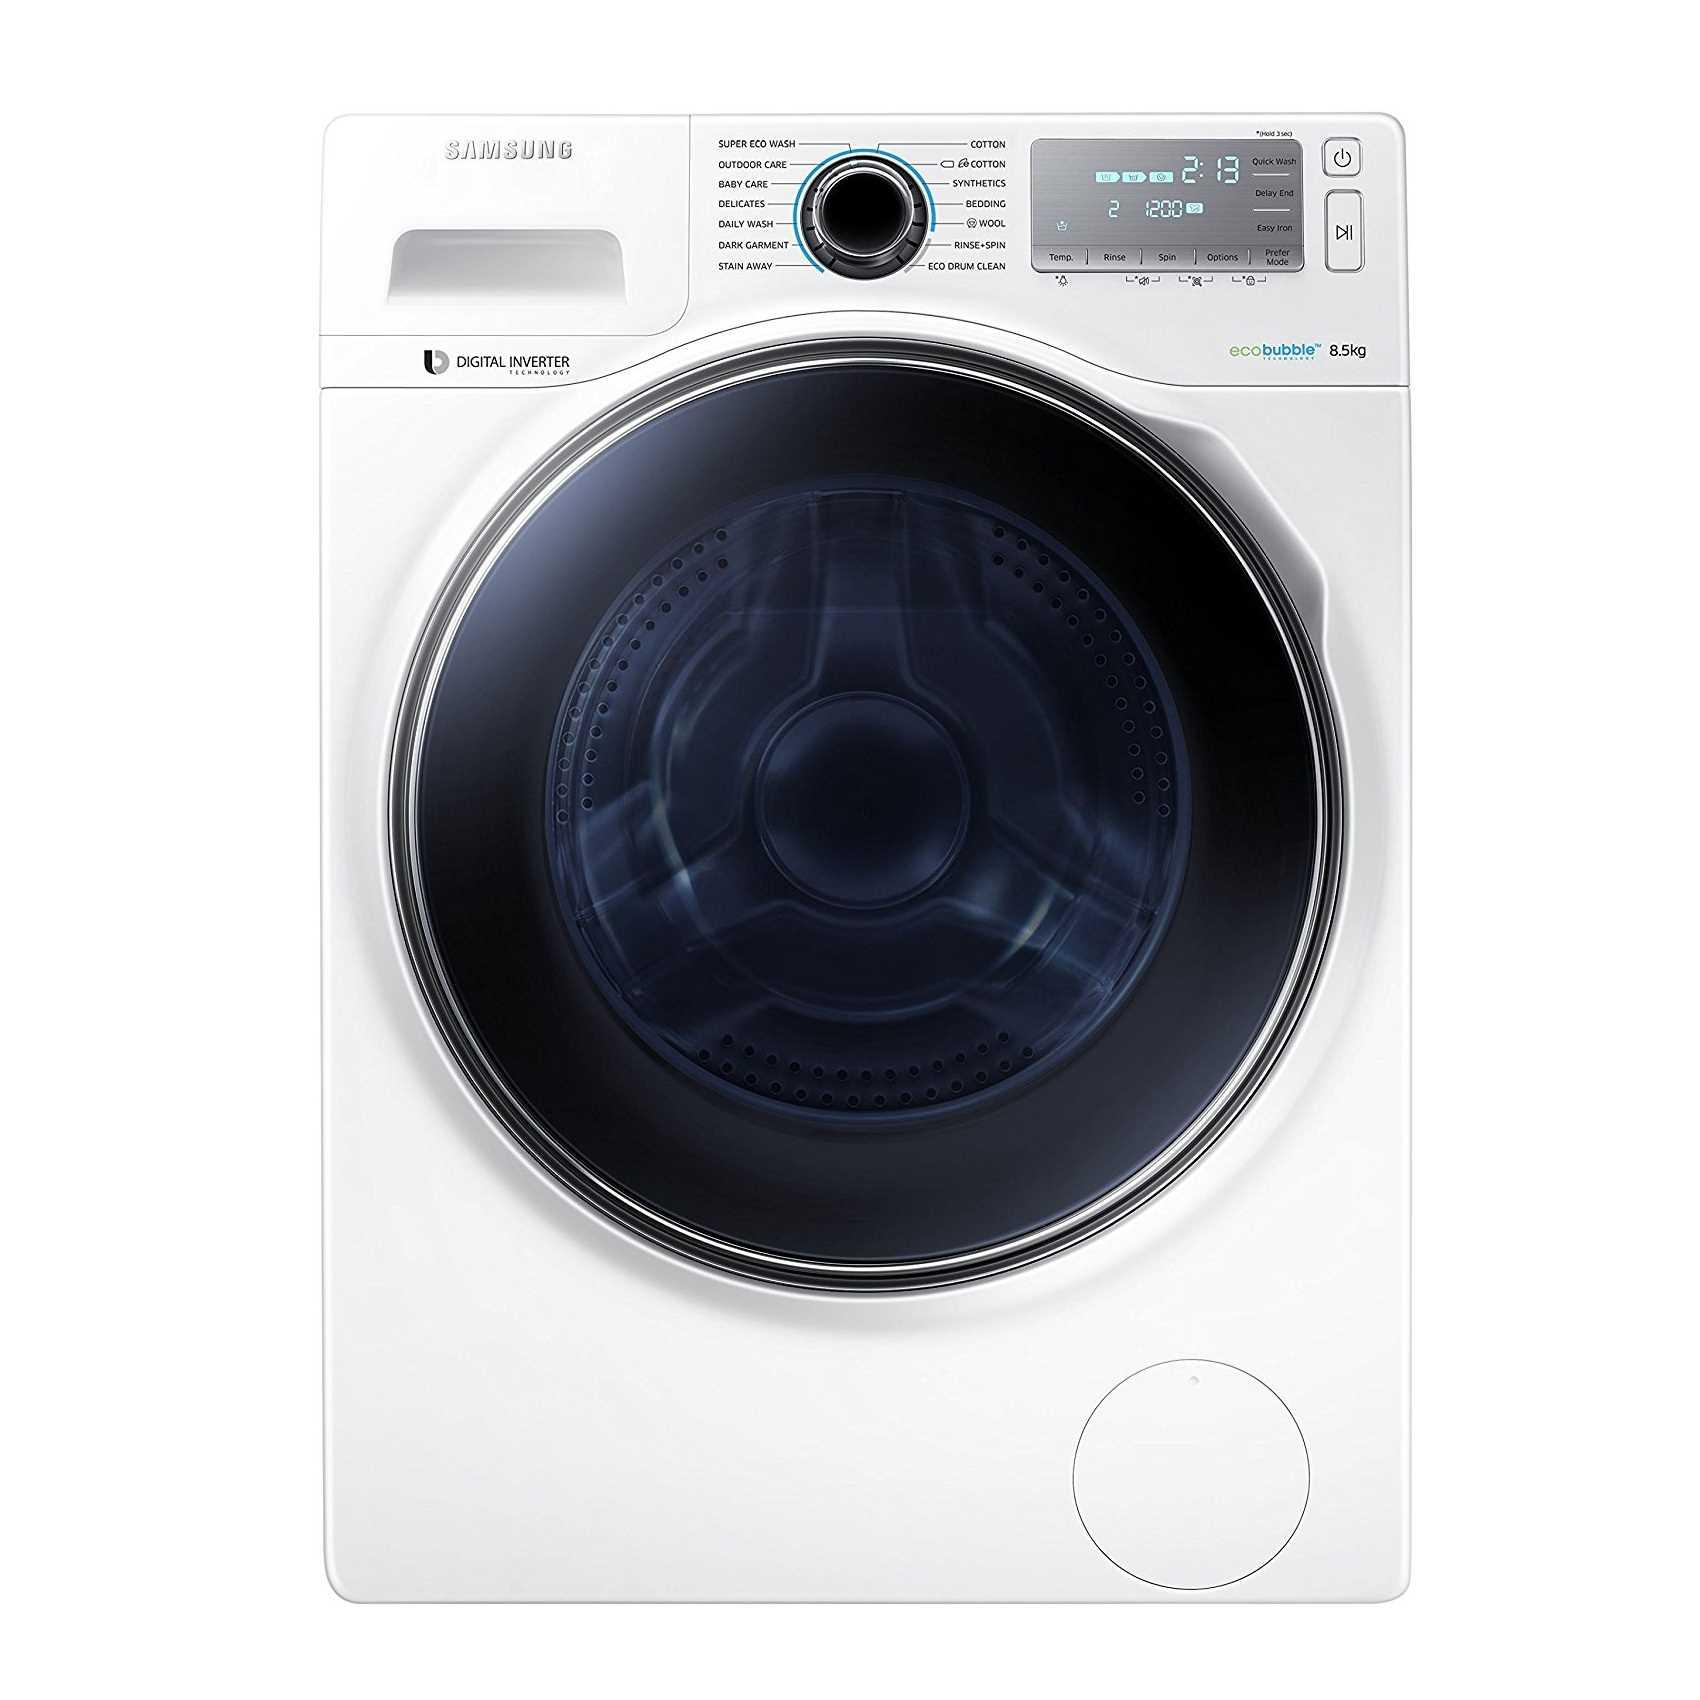 Samsung WW85H7410EW TL 8.5 Kg Fully Automatic Front Loading Washing Machine